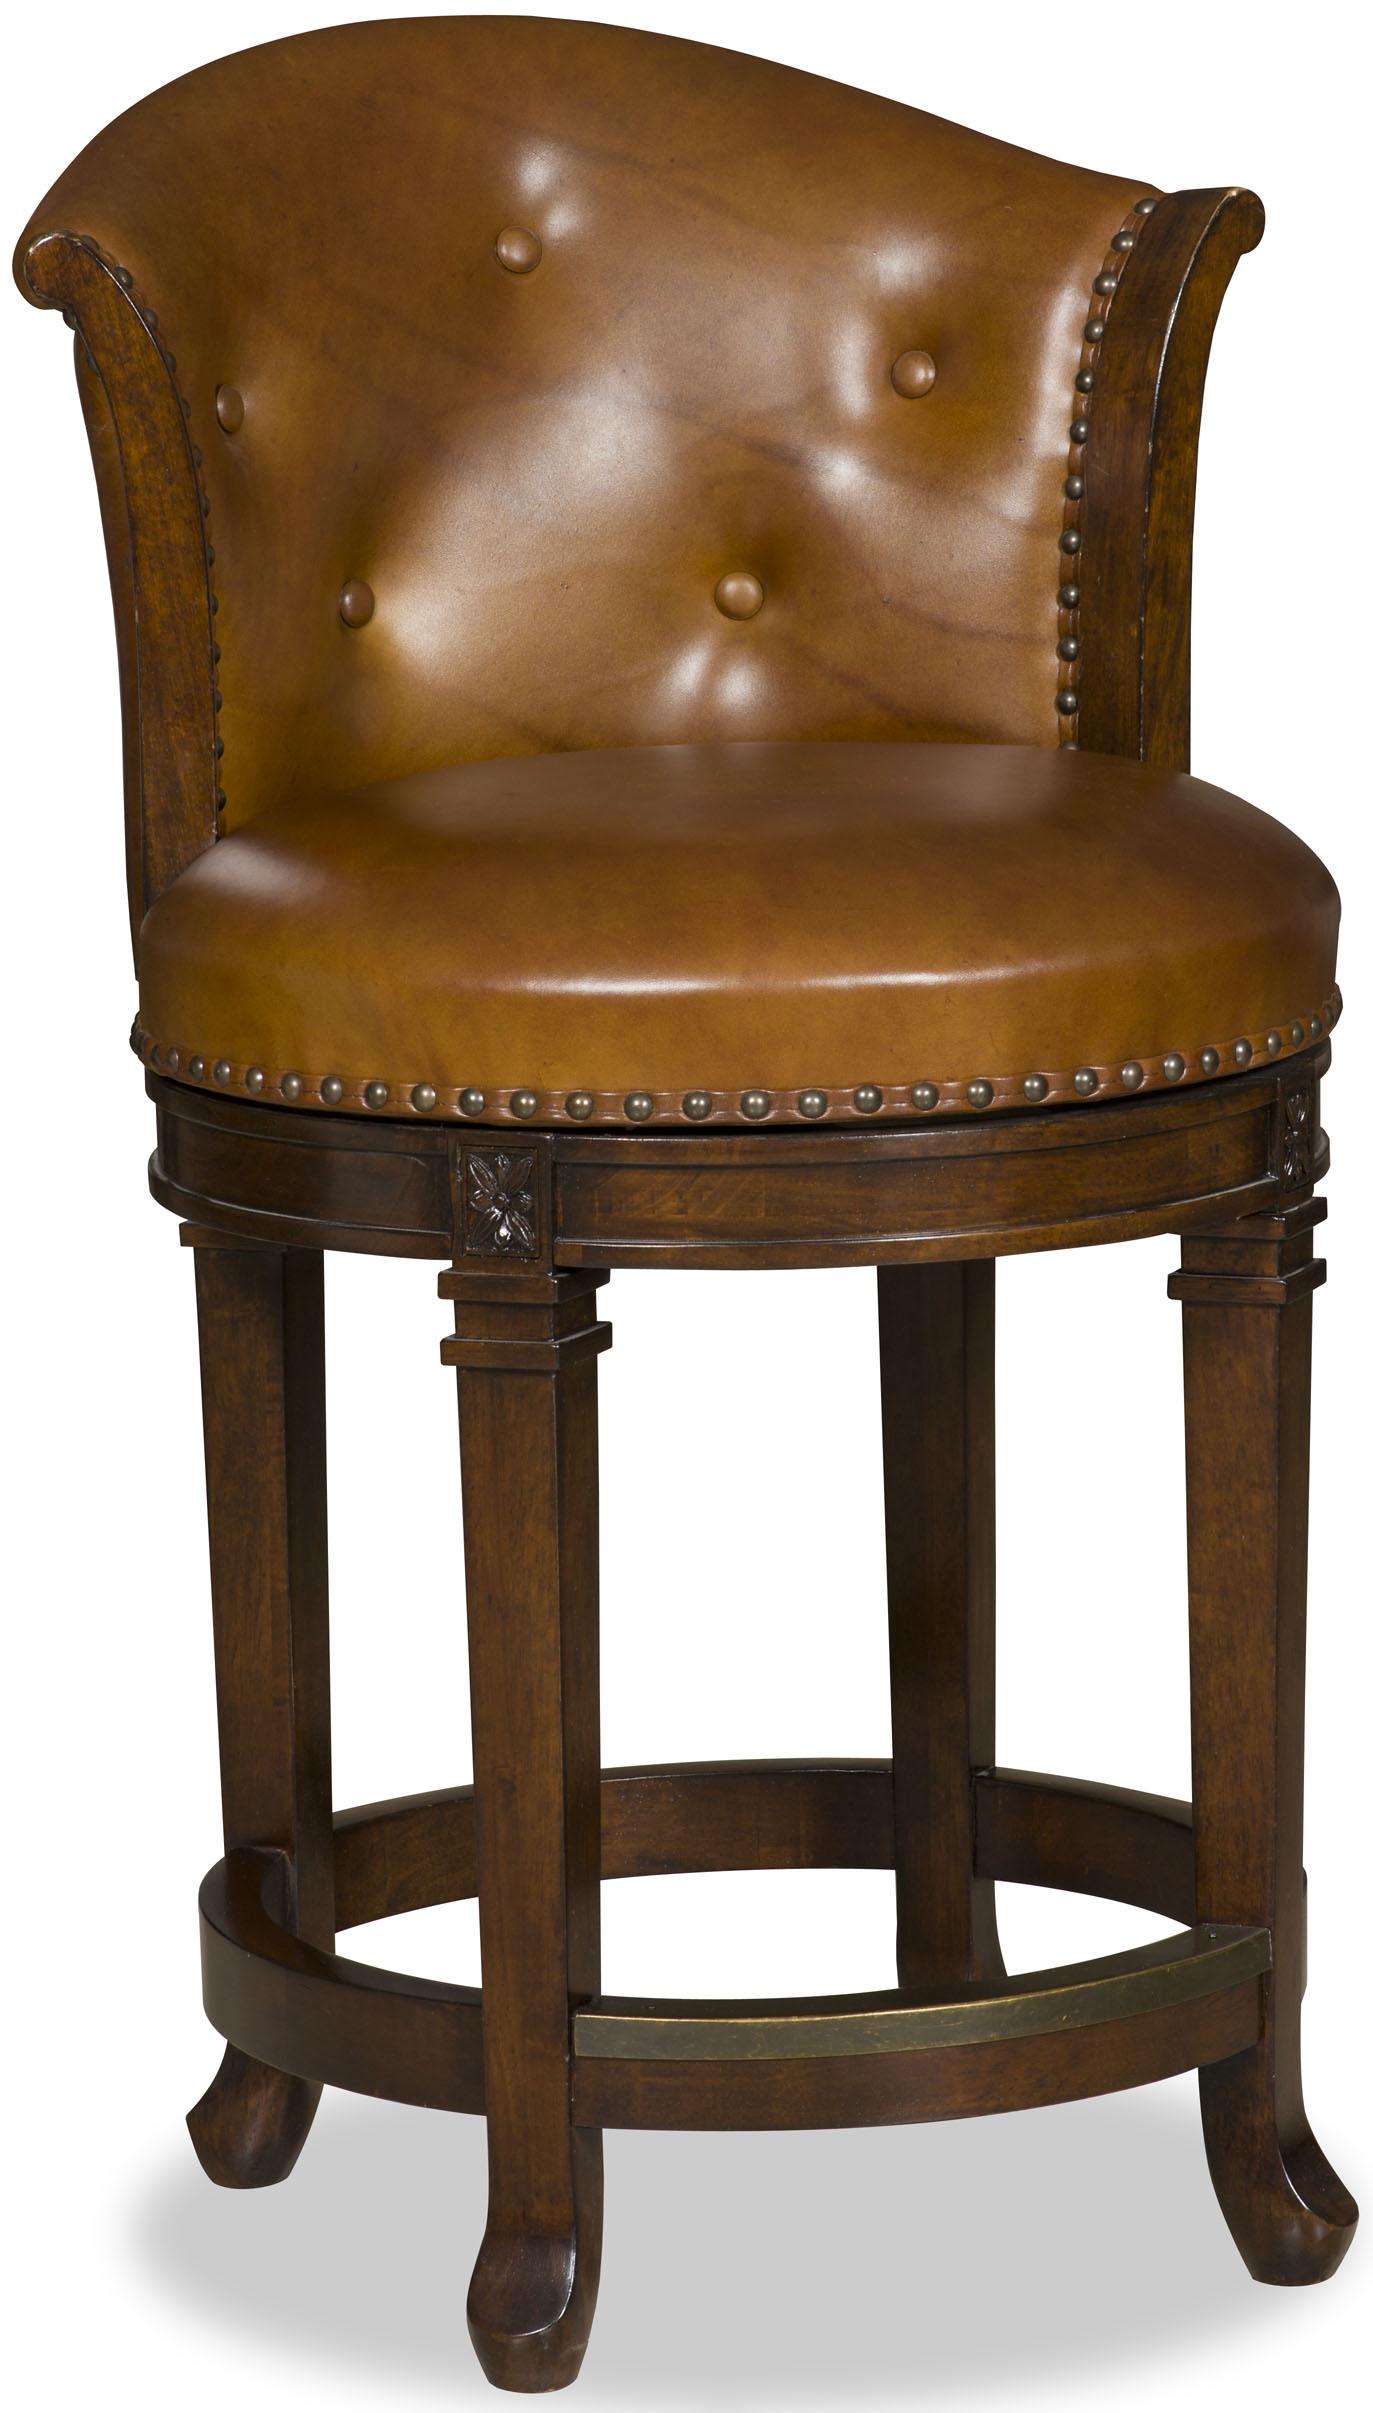 Hooker Furniture Stools Dark Manhattan Transitional Counter Stool - Item Number: 300-25002